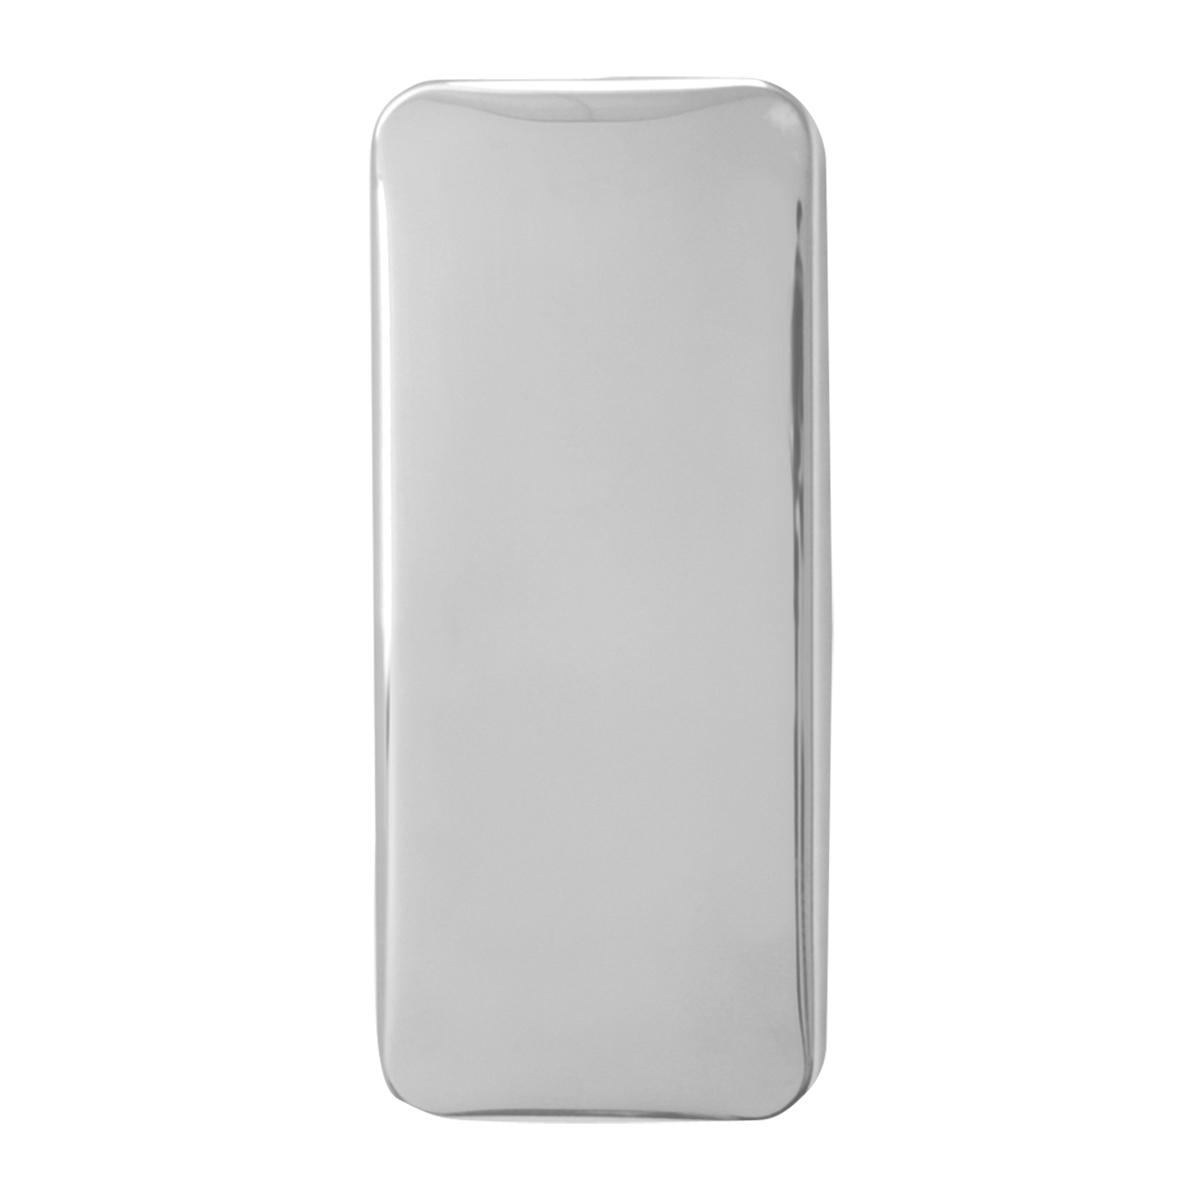 97568 Exterior Vent Door Cover for Peterbilt